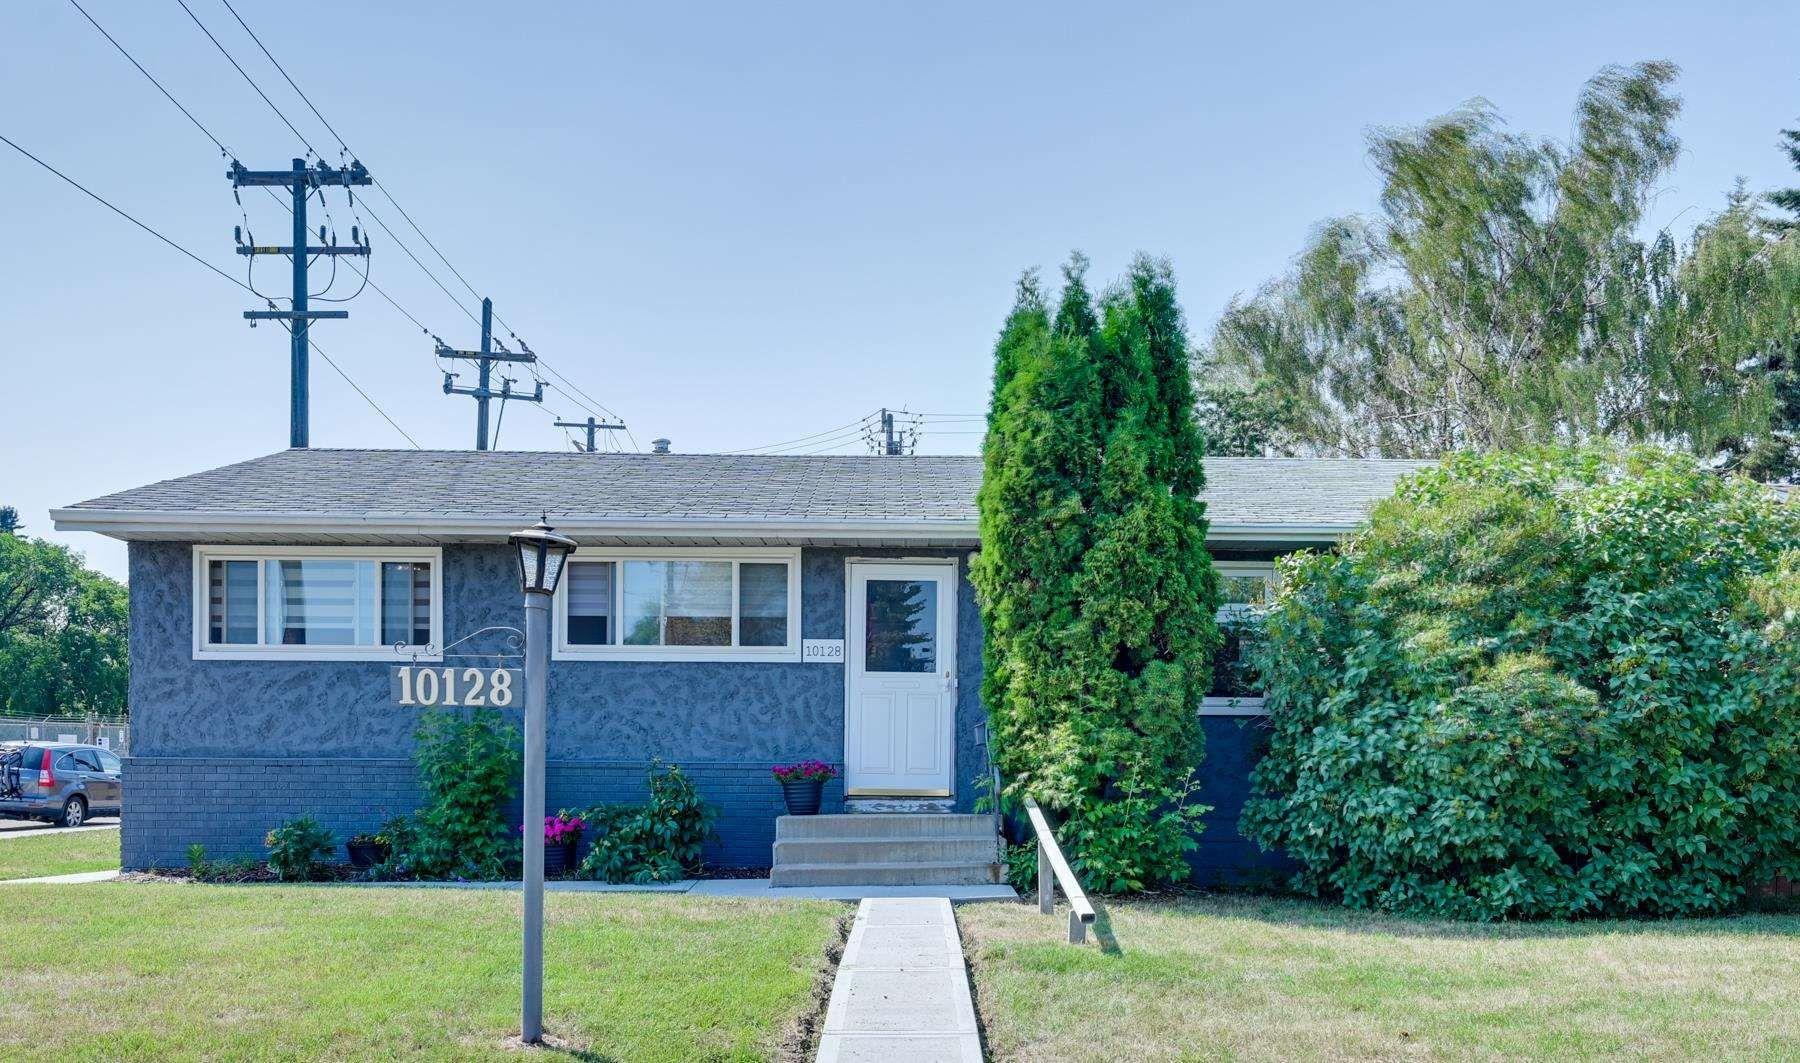 Main Photo: 10128 50 Street in Edmonton: Zone 19 House for sale : MLS®# E4256675